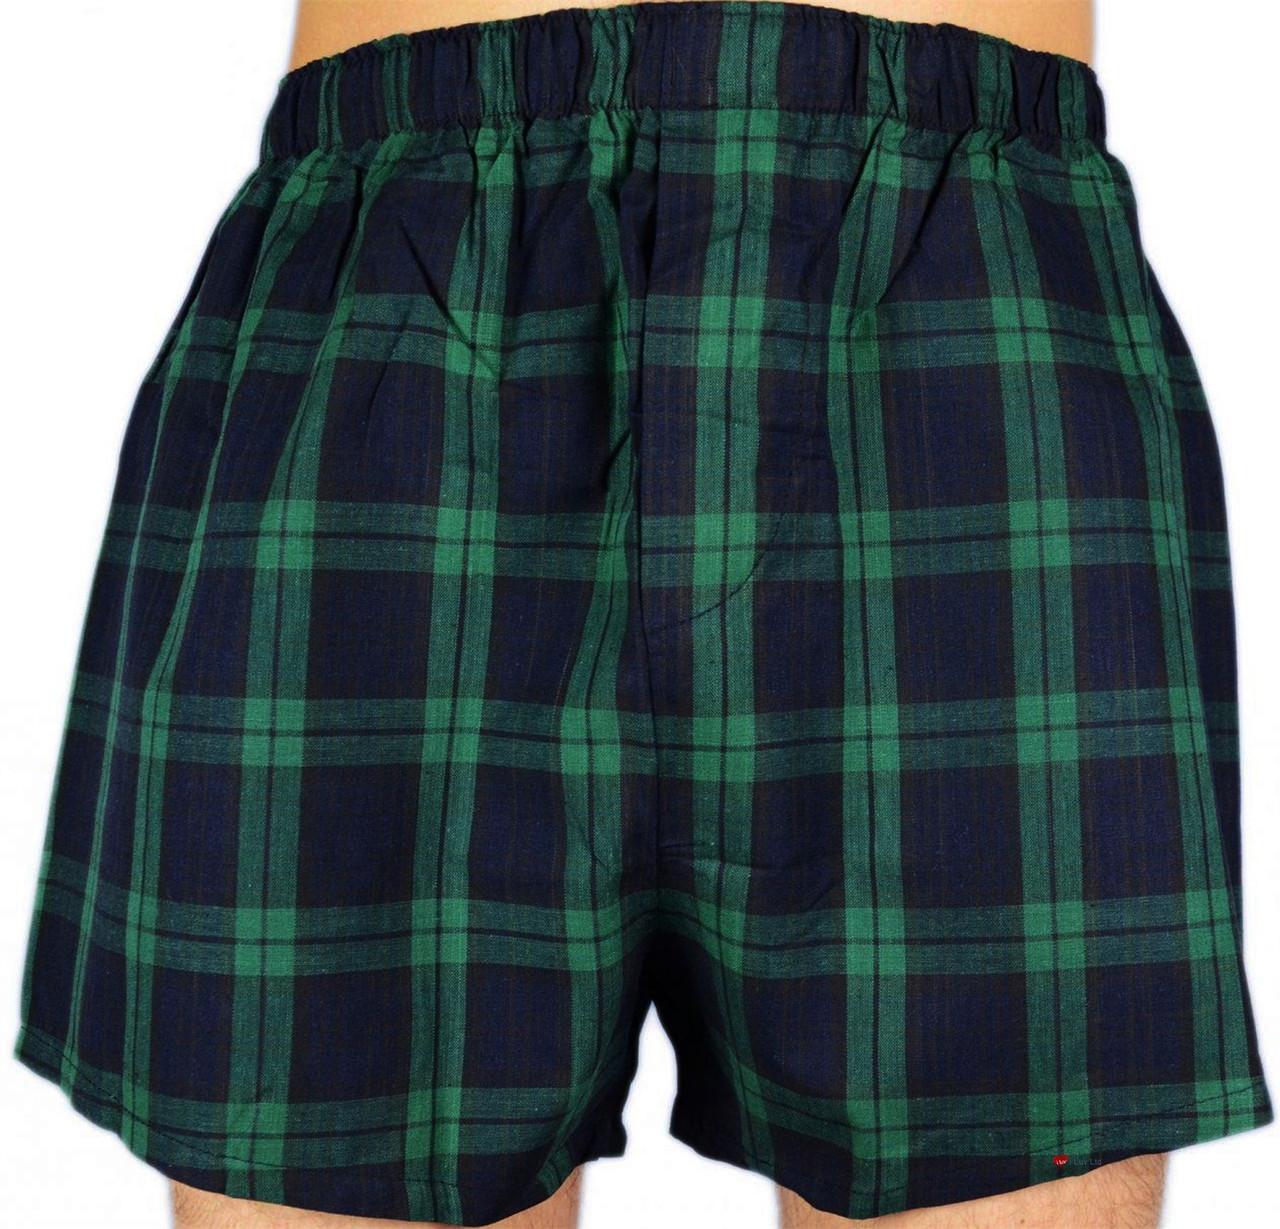 Scotland Boys Scottish Royal Stewart Soft Cotton Tartan Fashion Boxer Shorts New